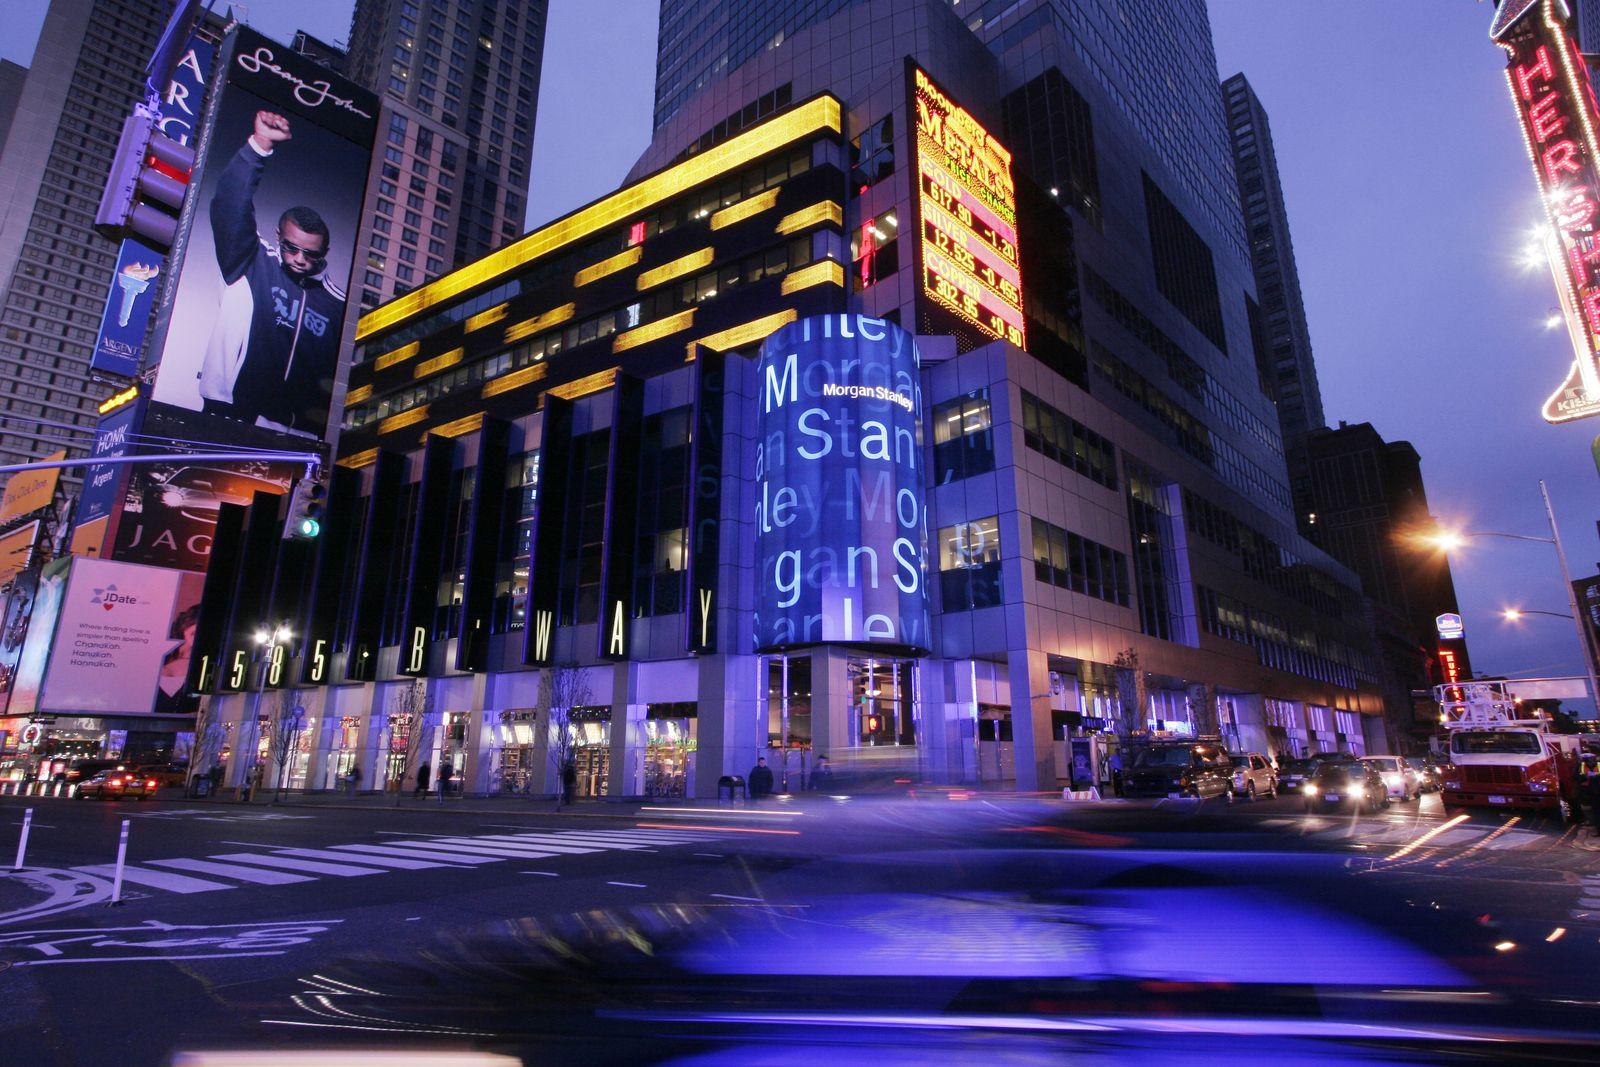 Morgan Stanley / New York